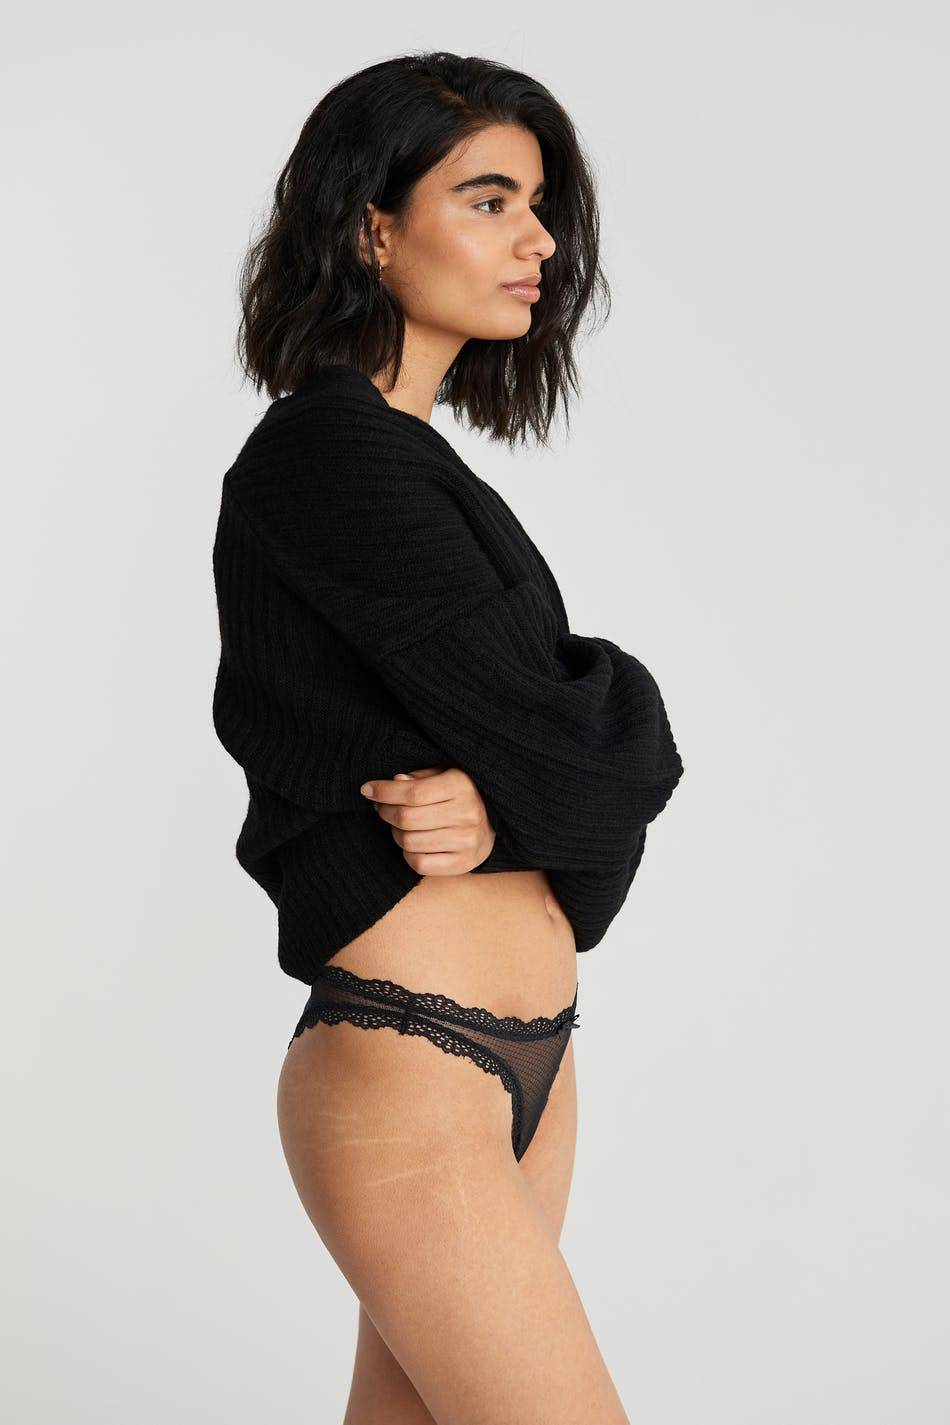 Gina Tricot Frida lace brazilian XL Female Black (9000)